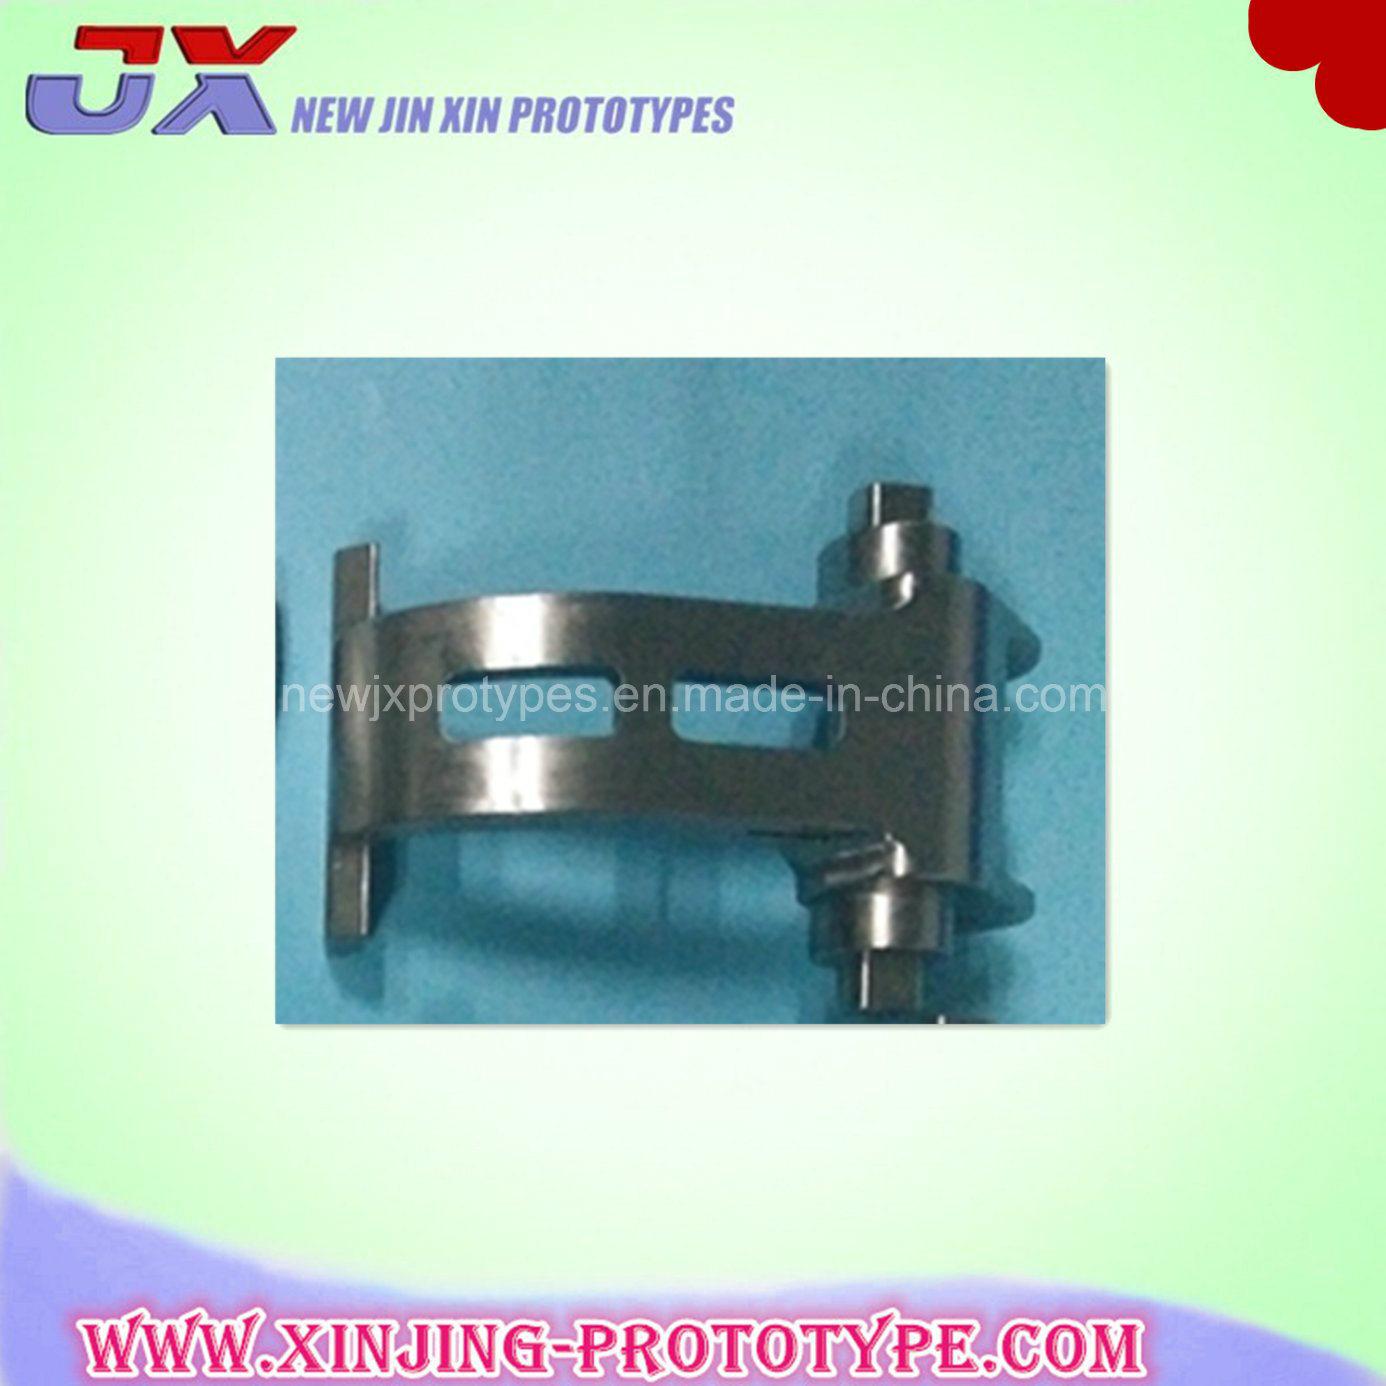 High Precision Aluminum CNC Machining/Metal Milling/Lathe Turning